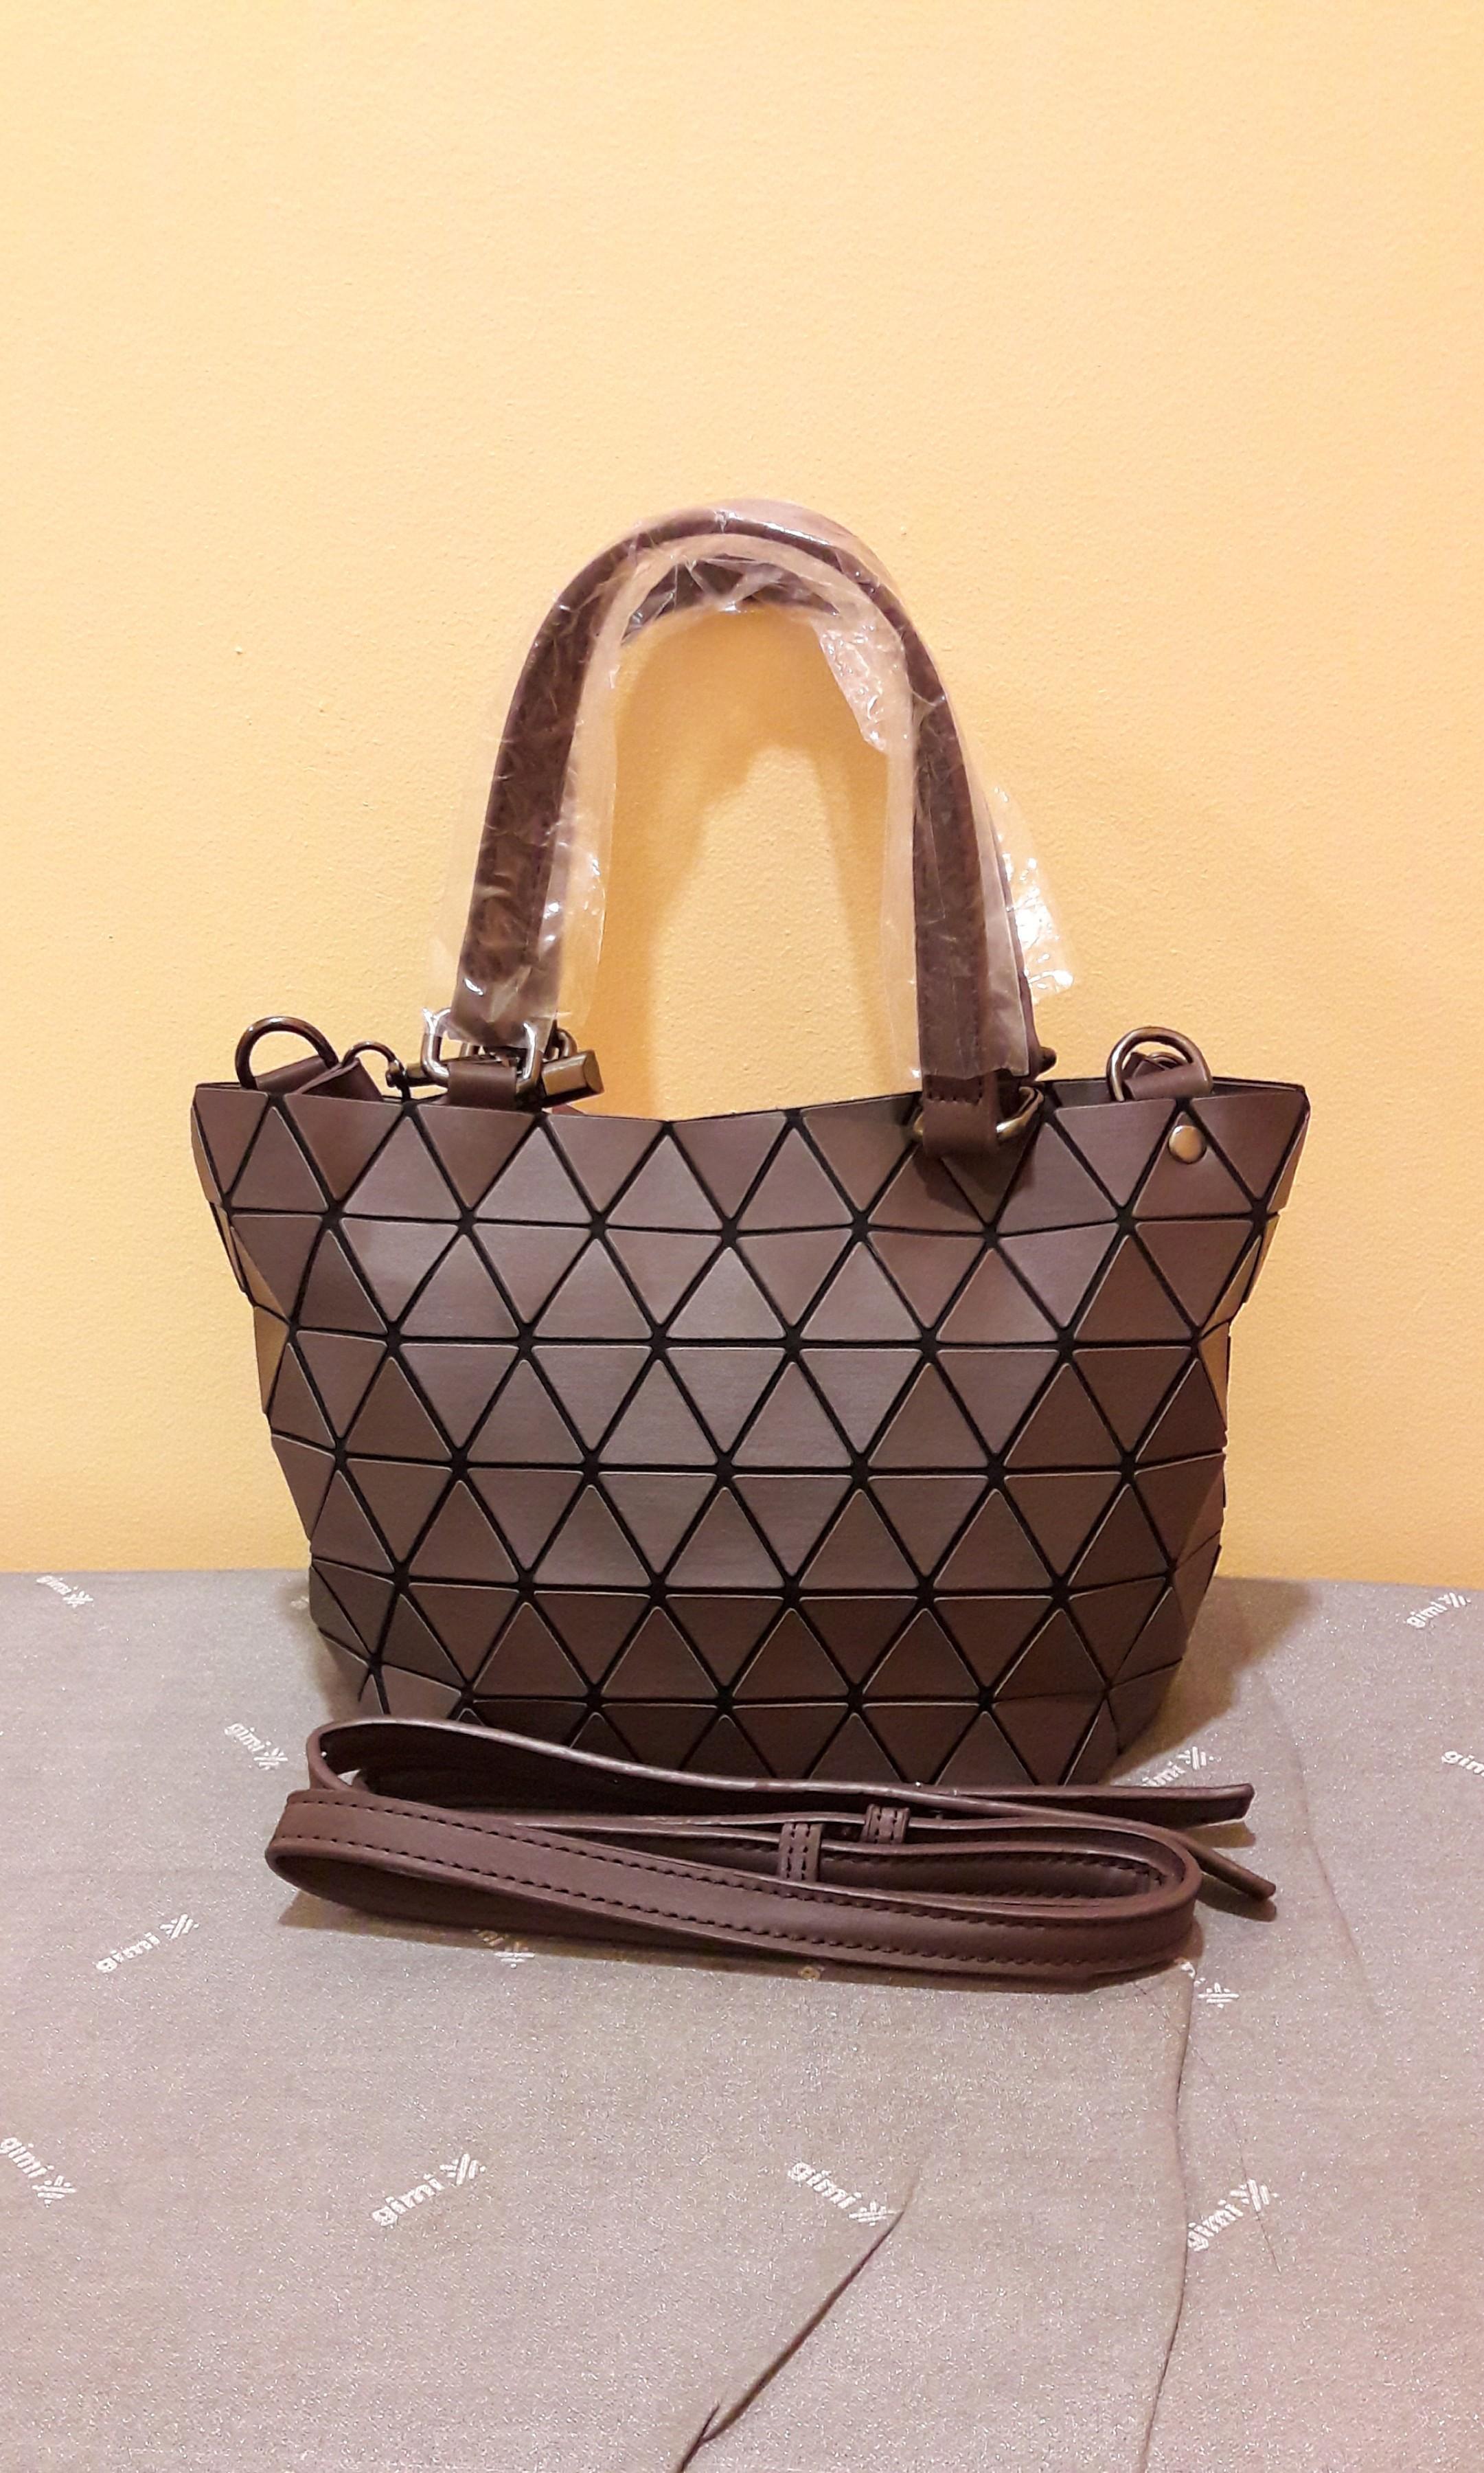 BRAND NEW Small Matte Brown Issey Miyake BAOBAO Inspired Geometric Rhombic 2-way Sling Bag / Shoulder Bag / Tote Bag